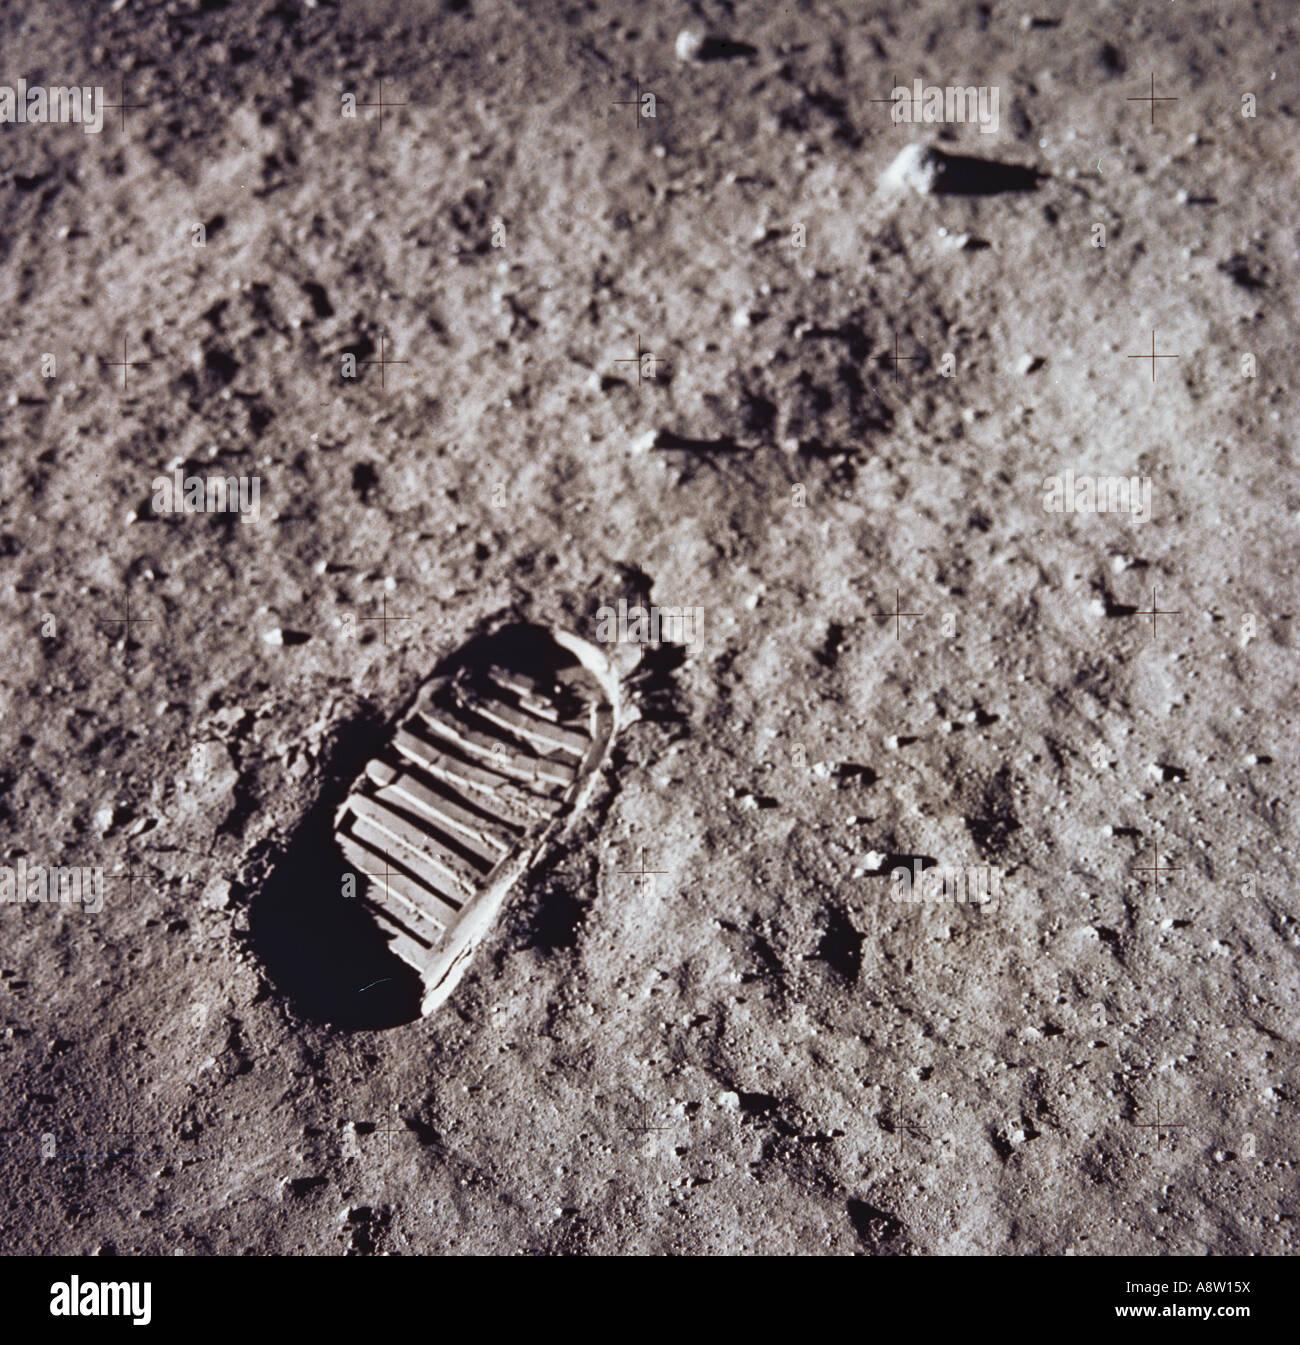 nasa moon footprint - photo #9